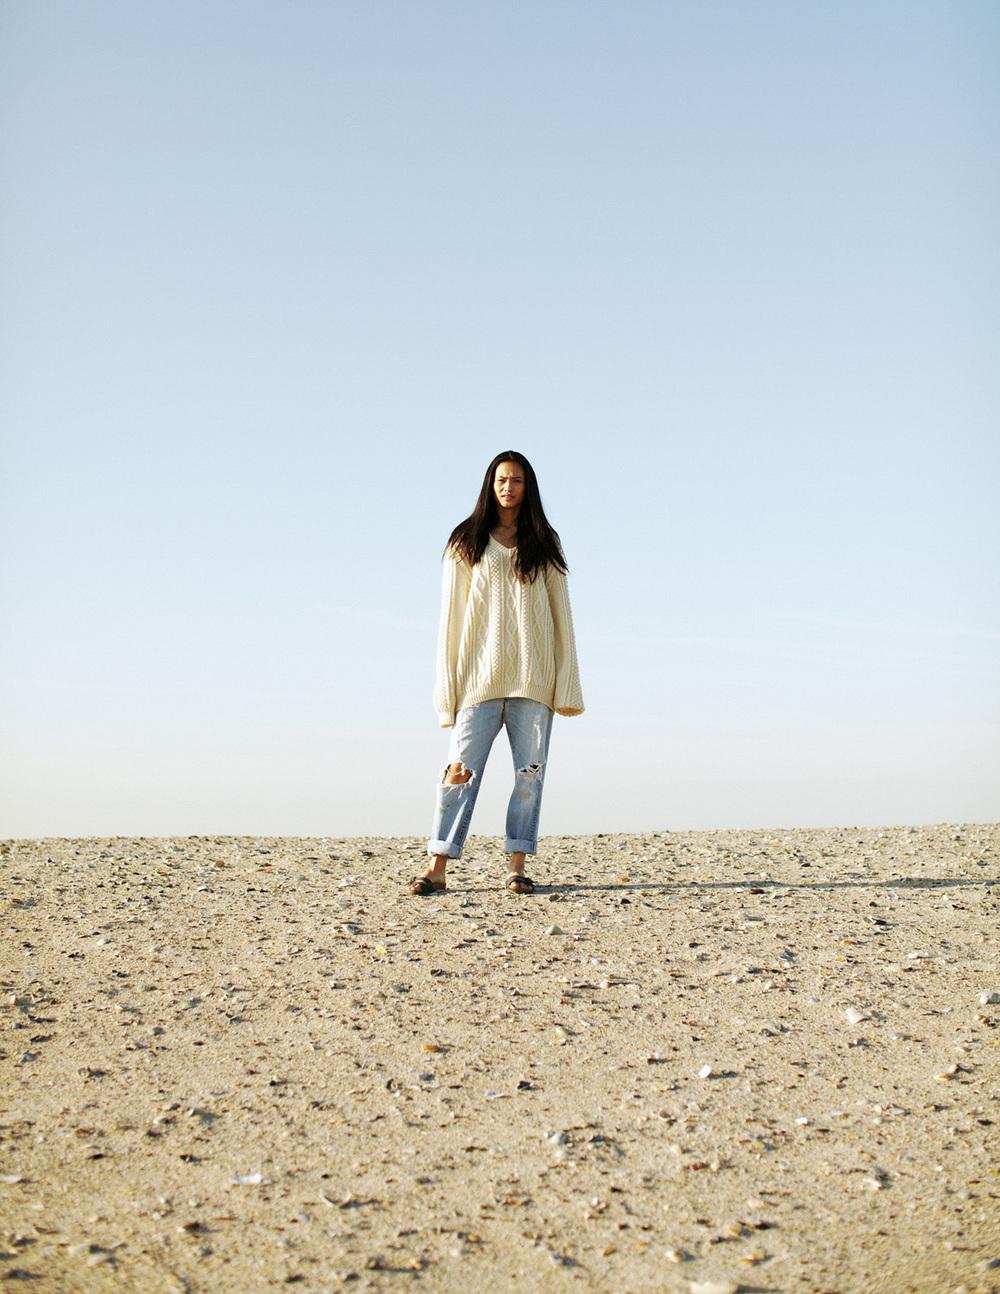 2014 Sharina Gutierrez // One Management